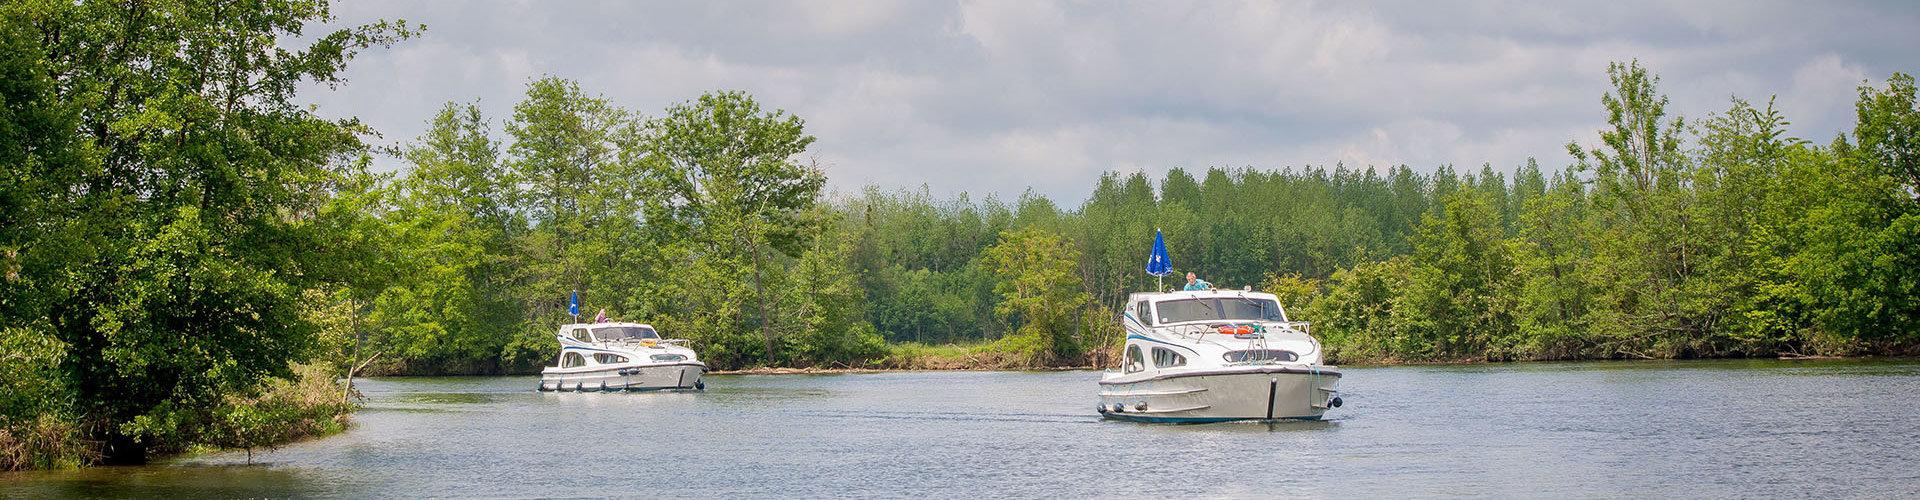 Naturliebhaber mit Le Boat